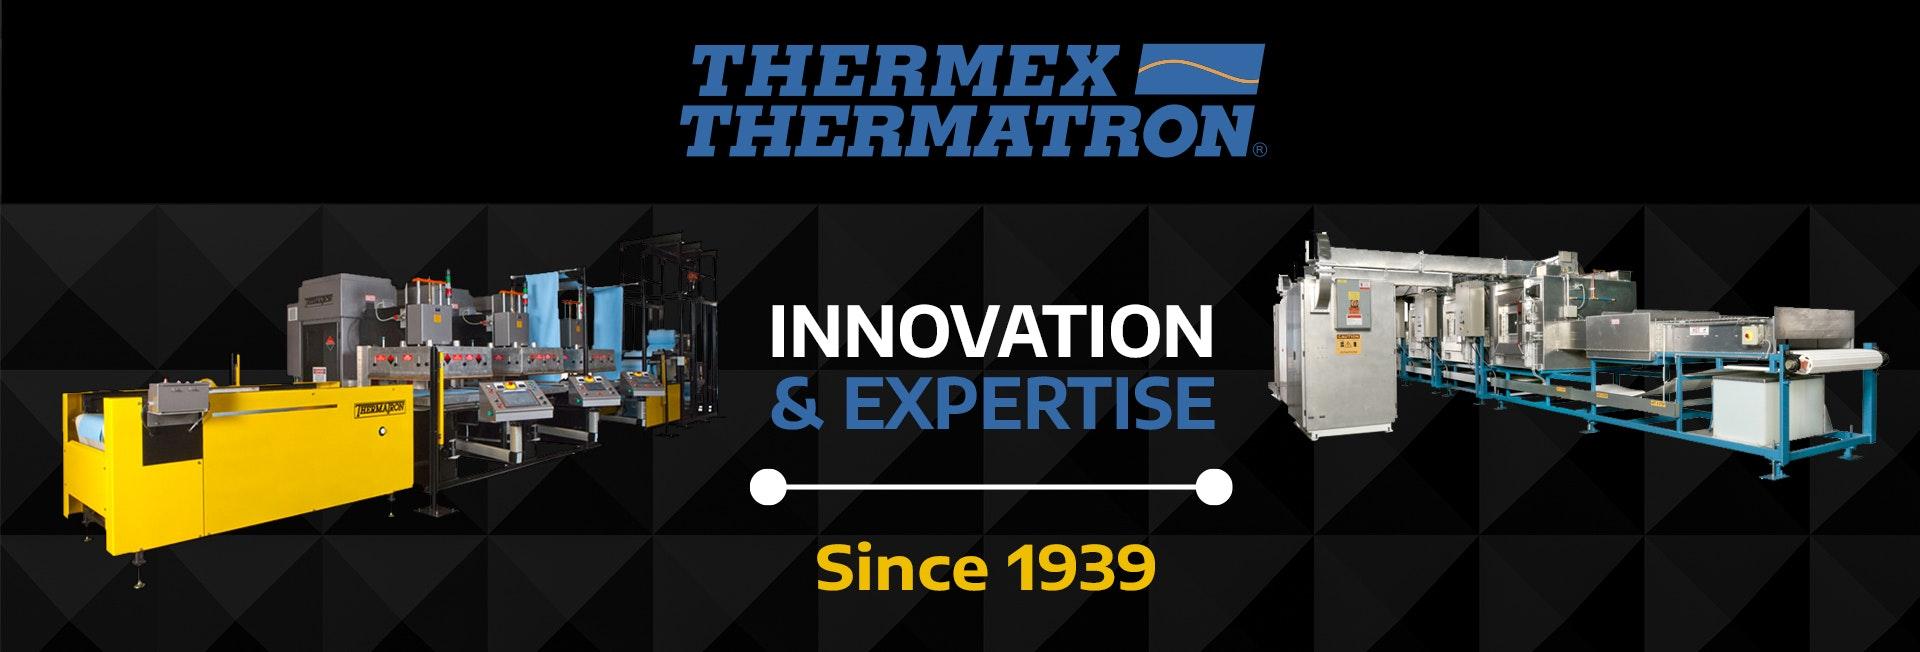 Thermex Image Copy 1